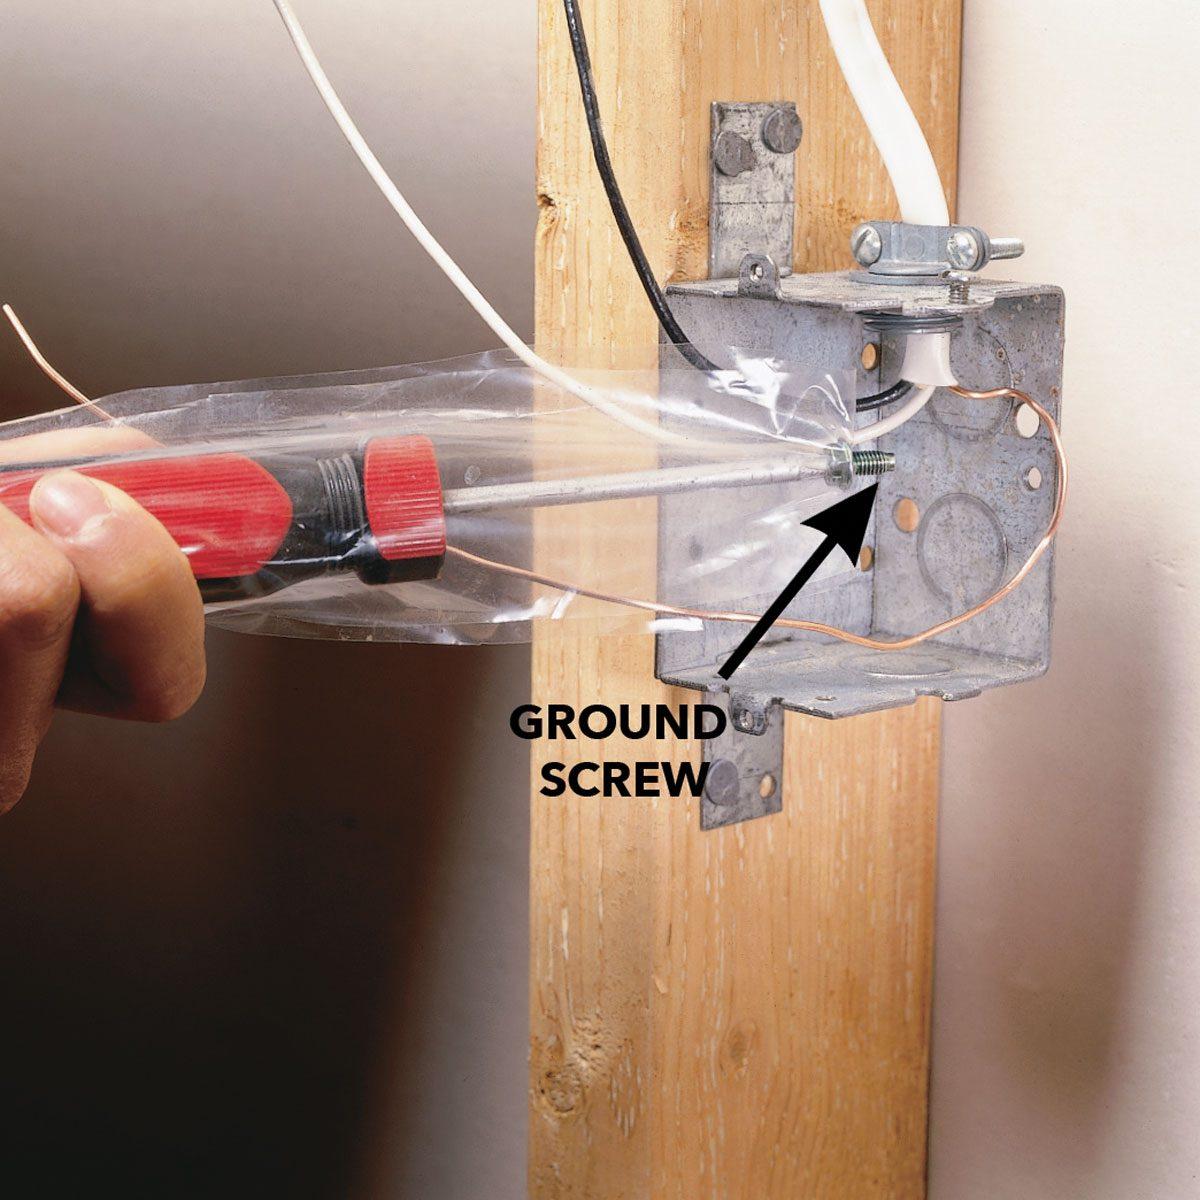 Third-Hand Screw Holder | The Family Handyman